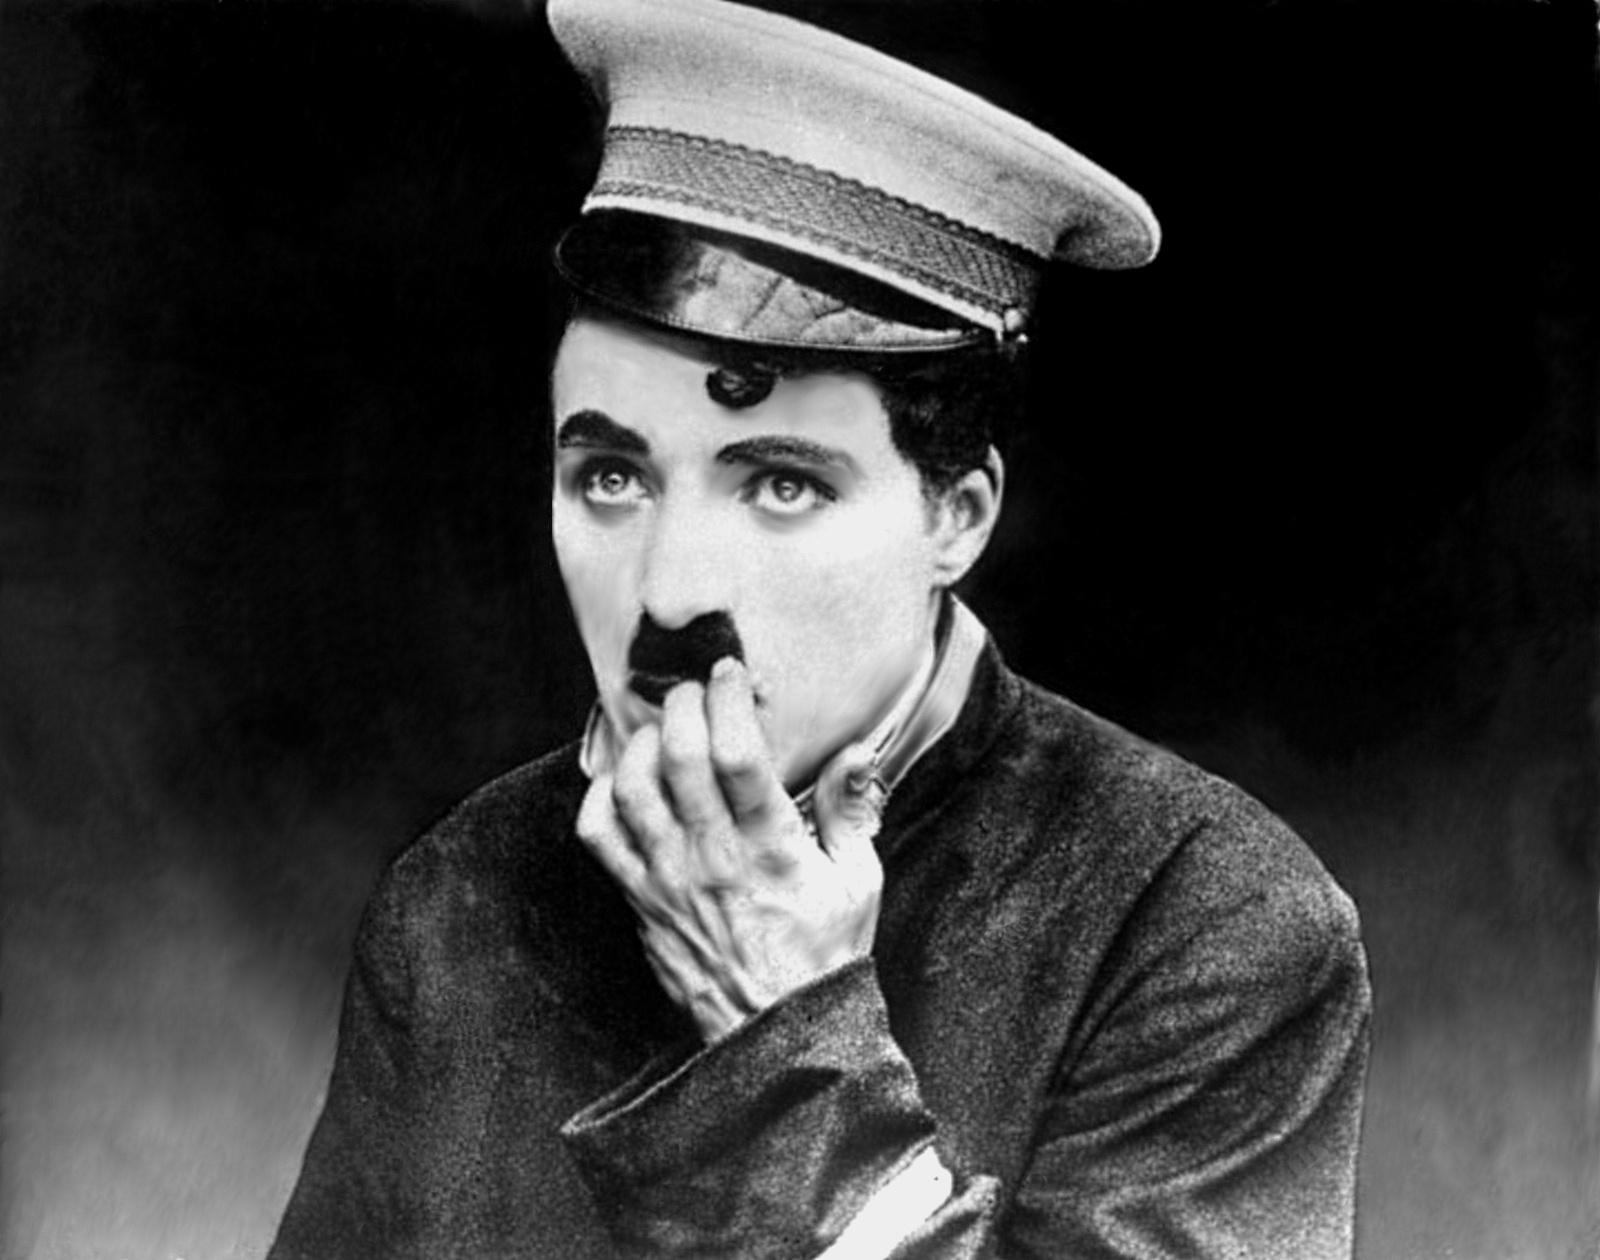 The Bank Chaplin charlie chaplin